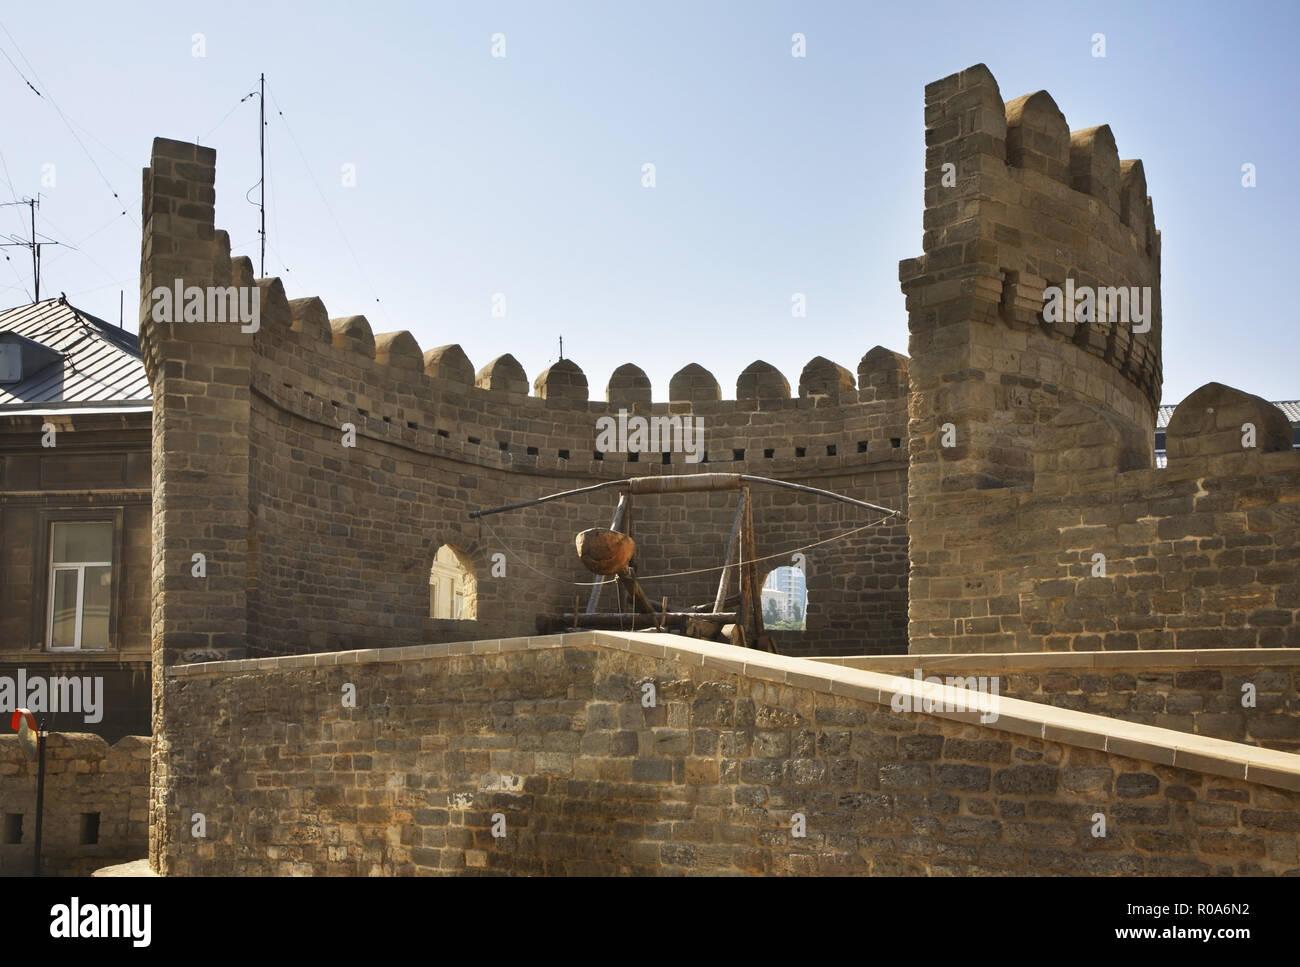 Icheri Sheher in Baku. Azerbaijan - Stock Image